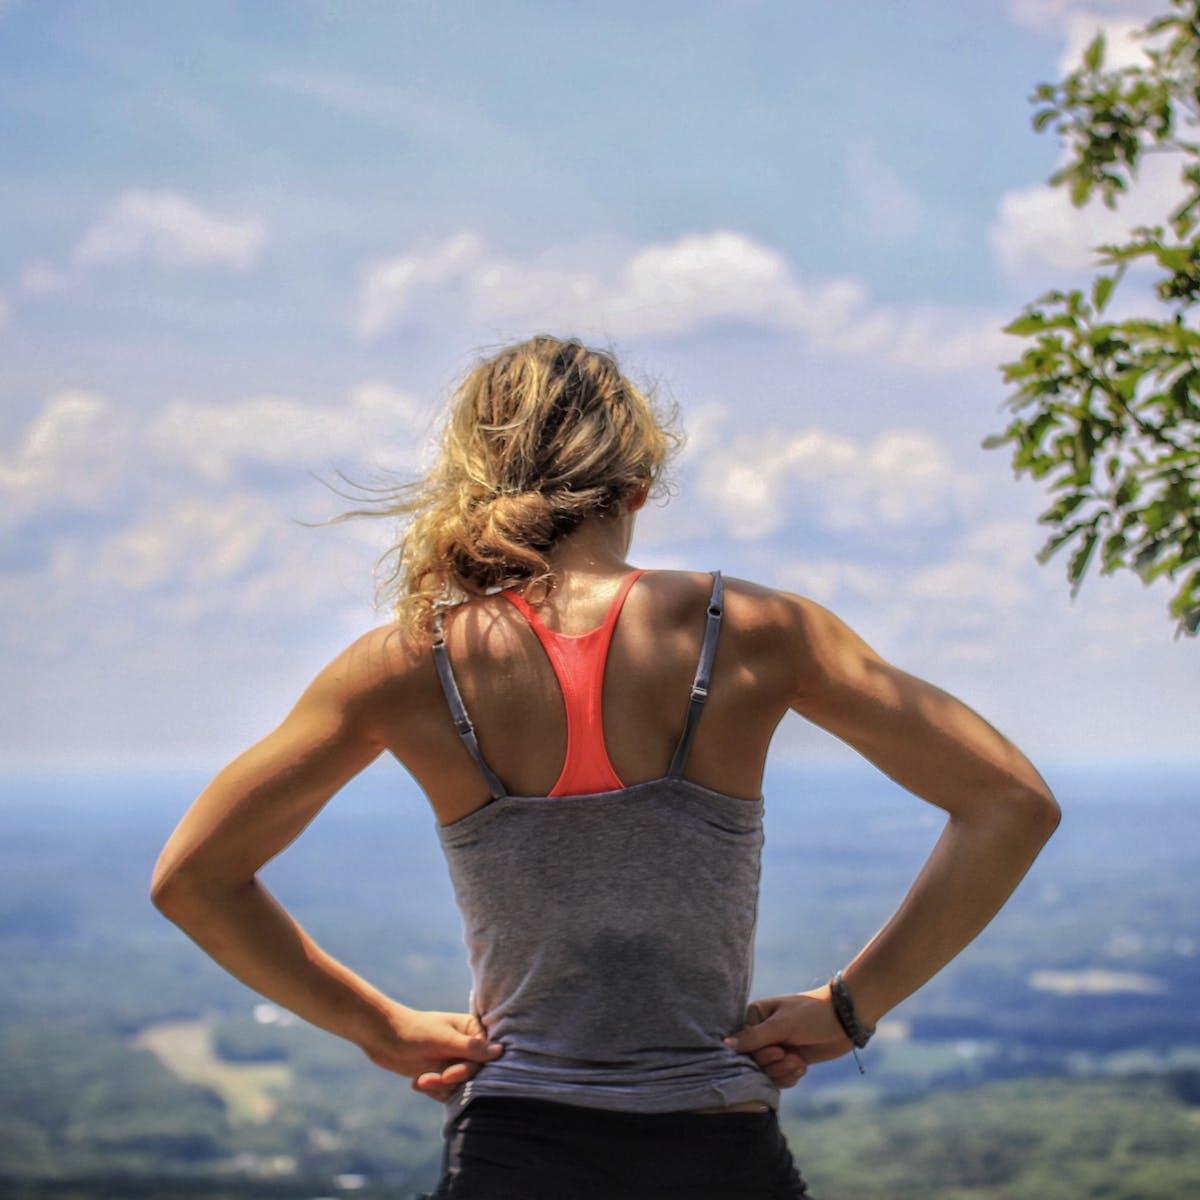 6 Nimble Jogging Tips for Beginners